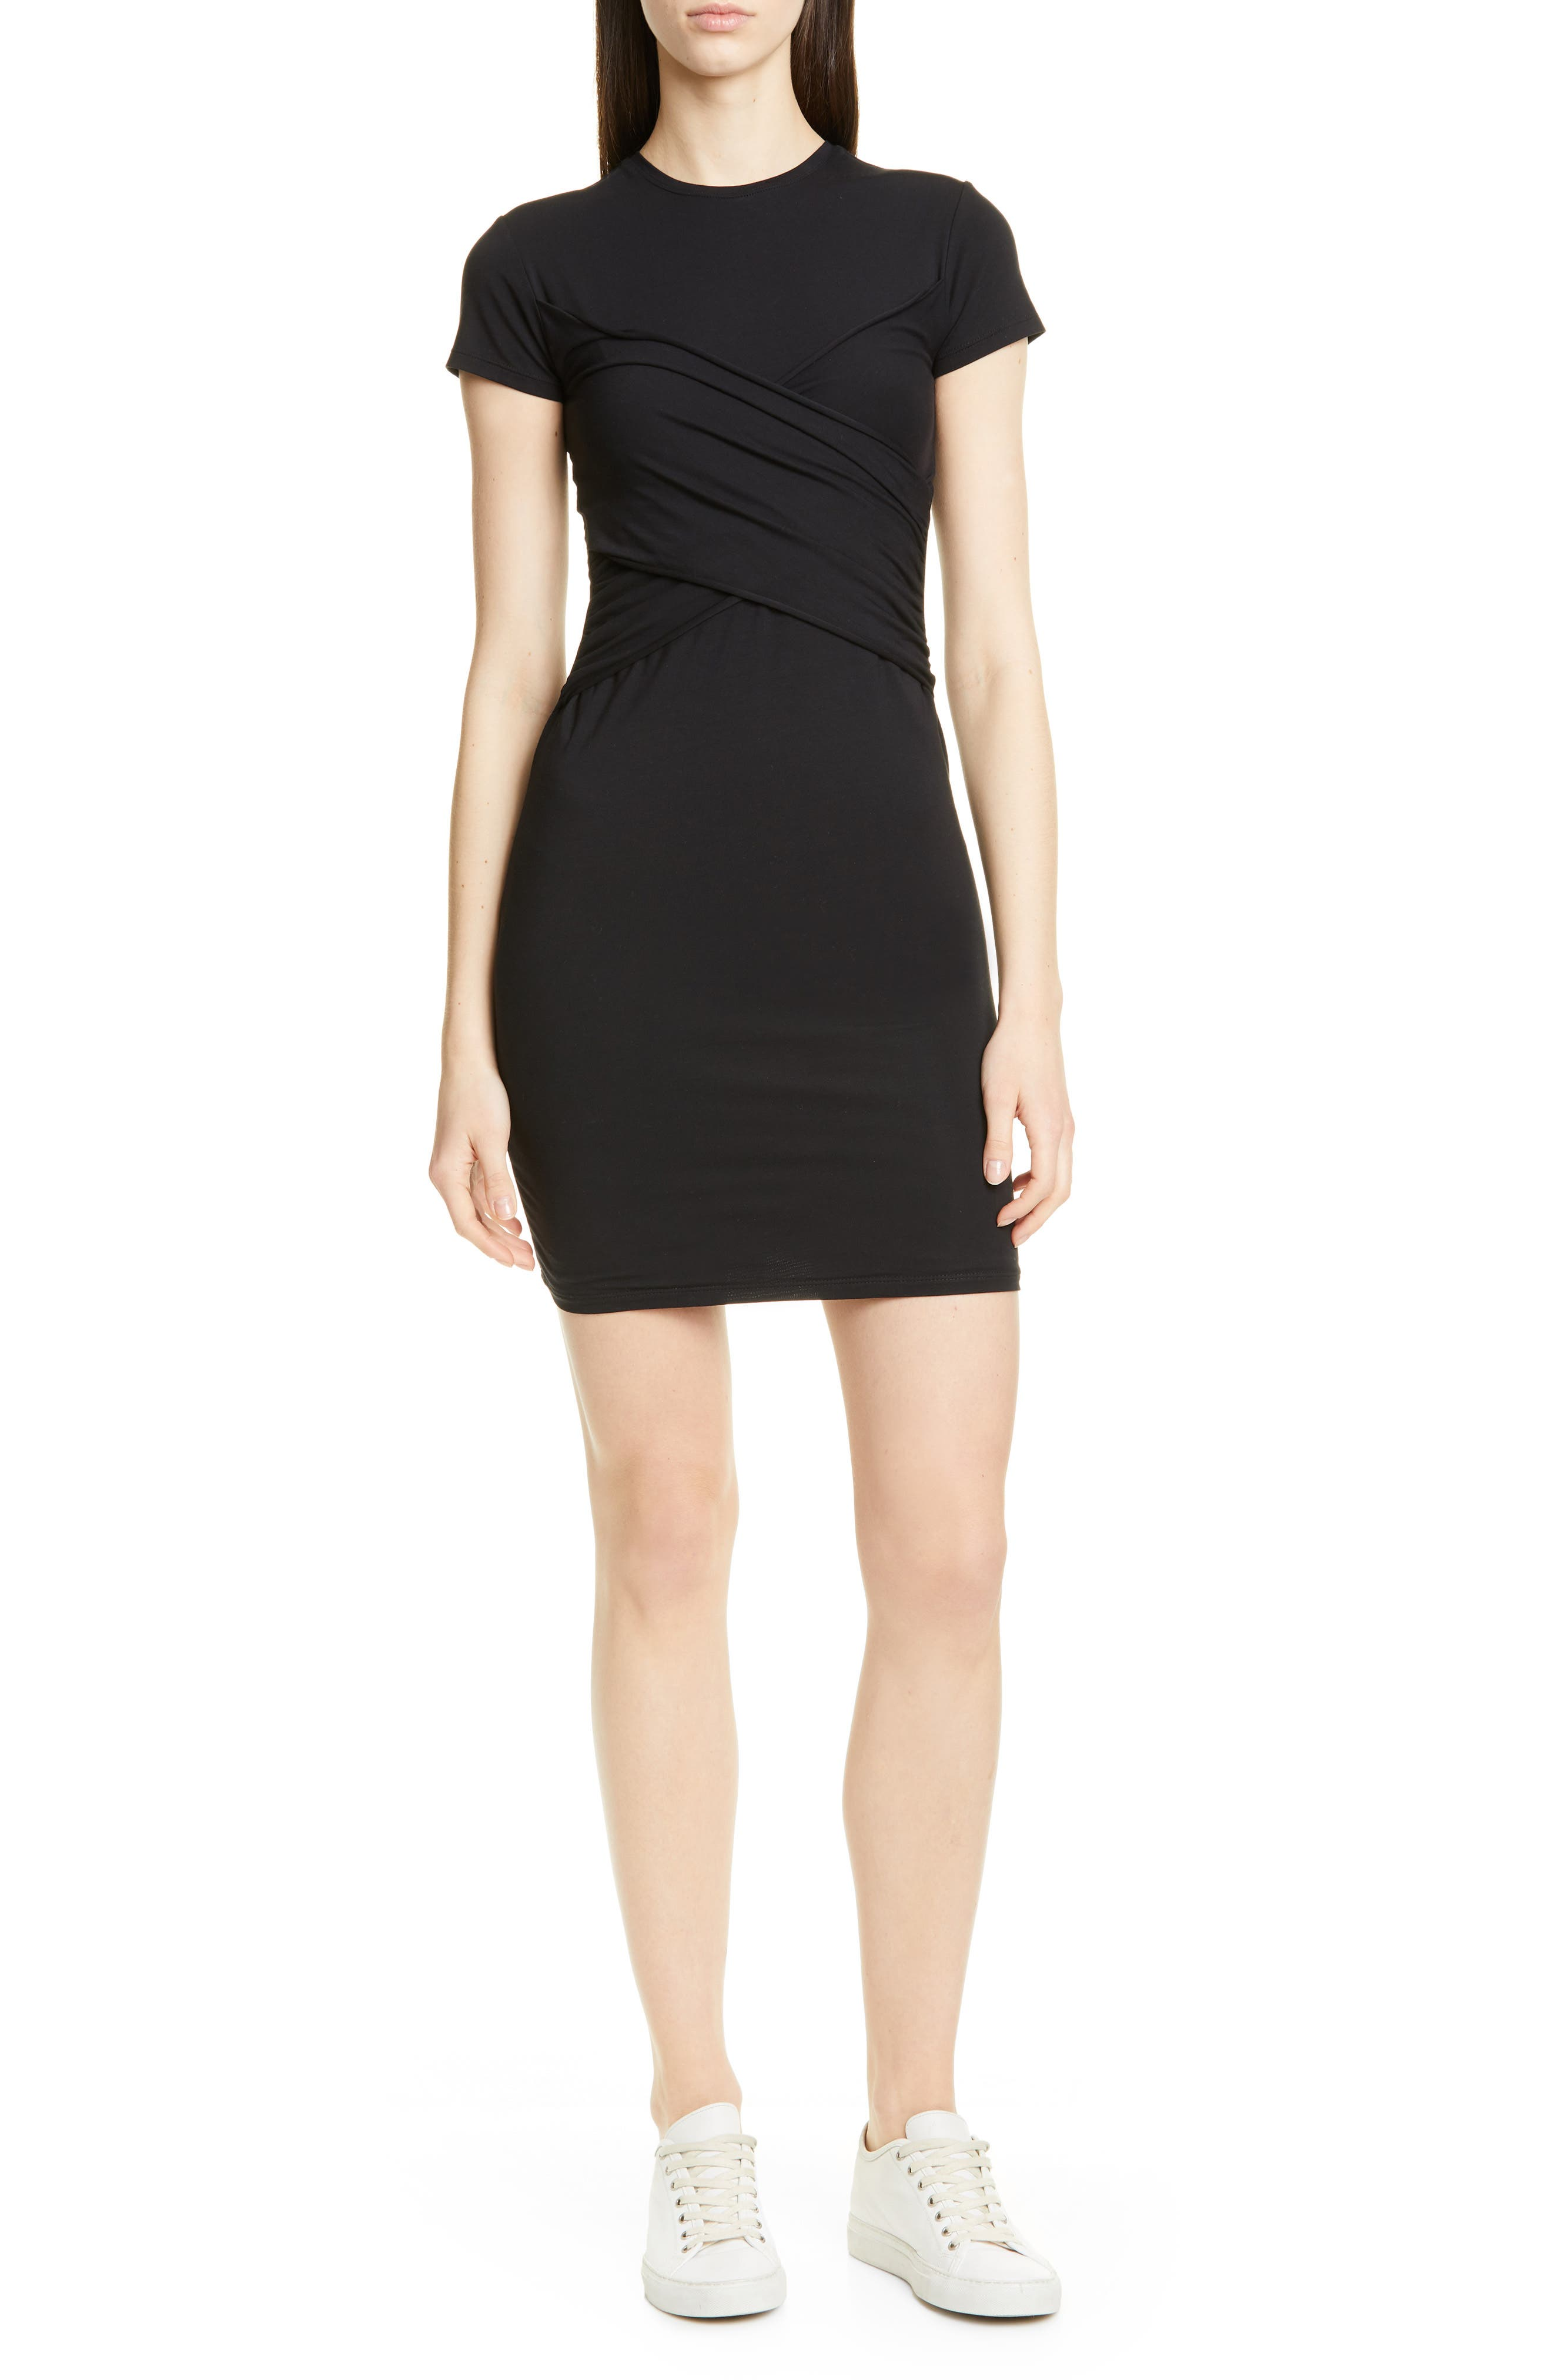 Atm Anthony Thomas Melillo Stripe Jersey T-Shirt Dress, Black